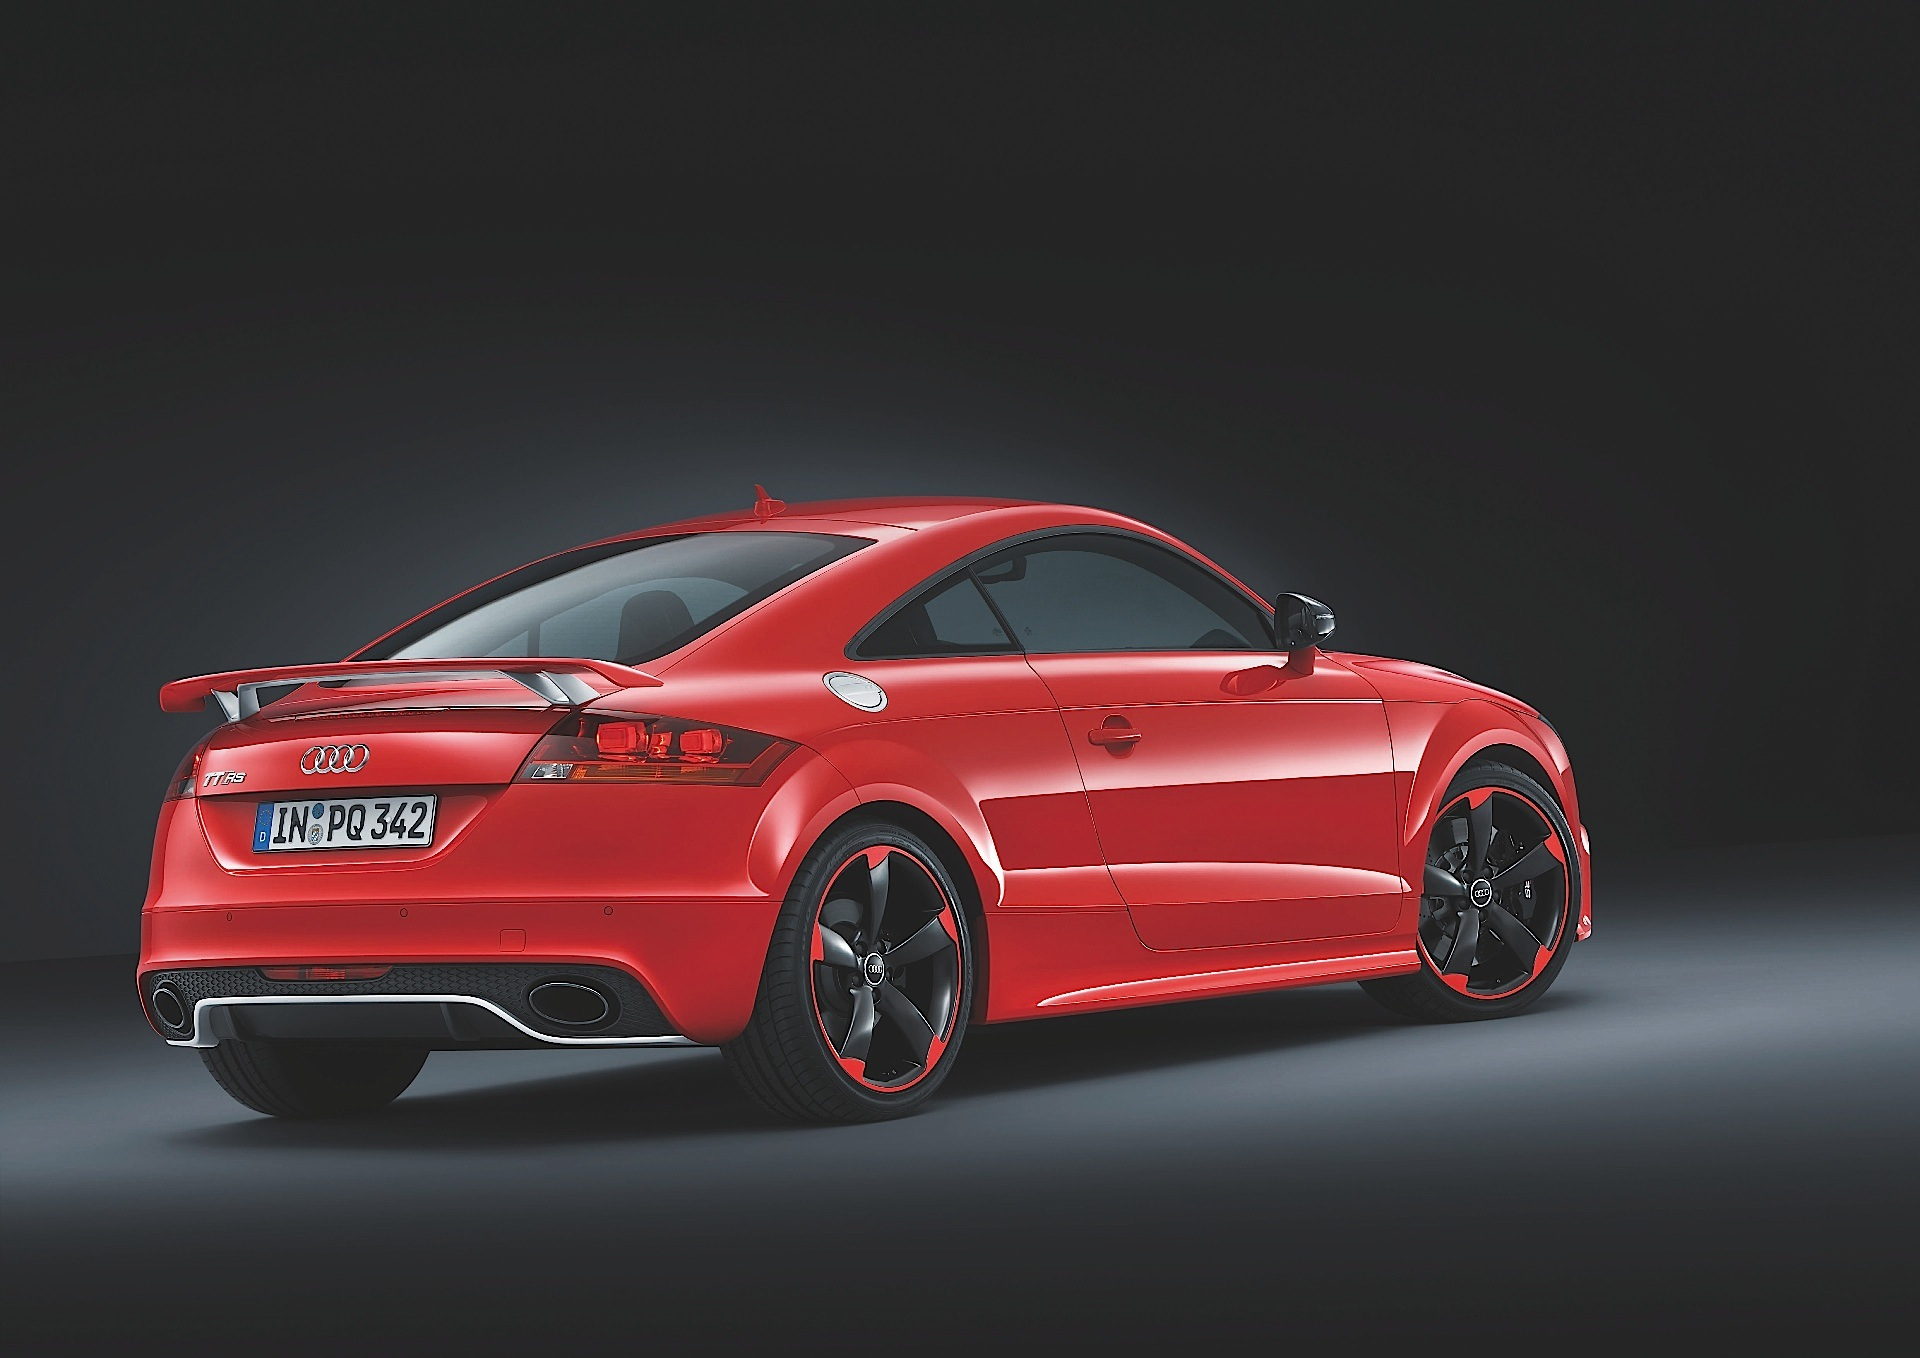 Audi Rs3 2018 >> AUDI TT RS Plus specs - 2012, 2013, 2014, 2015, 2016 ...